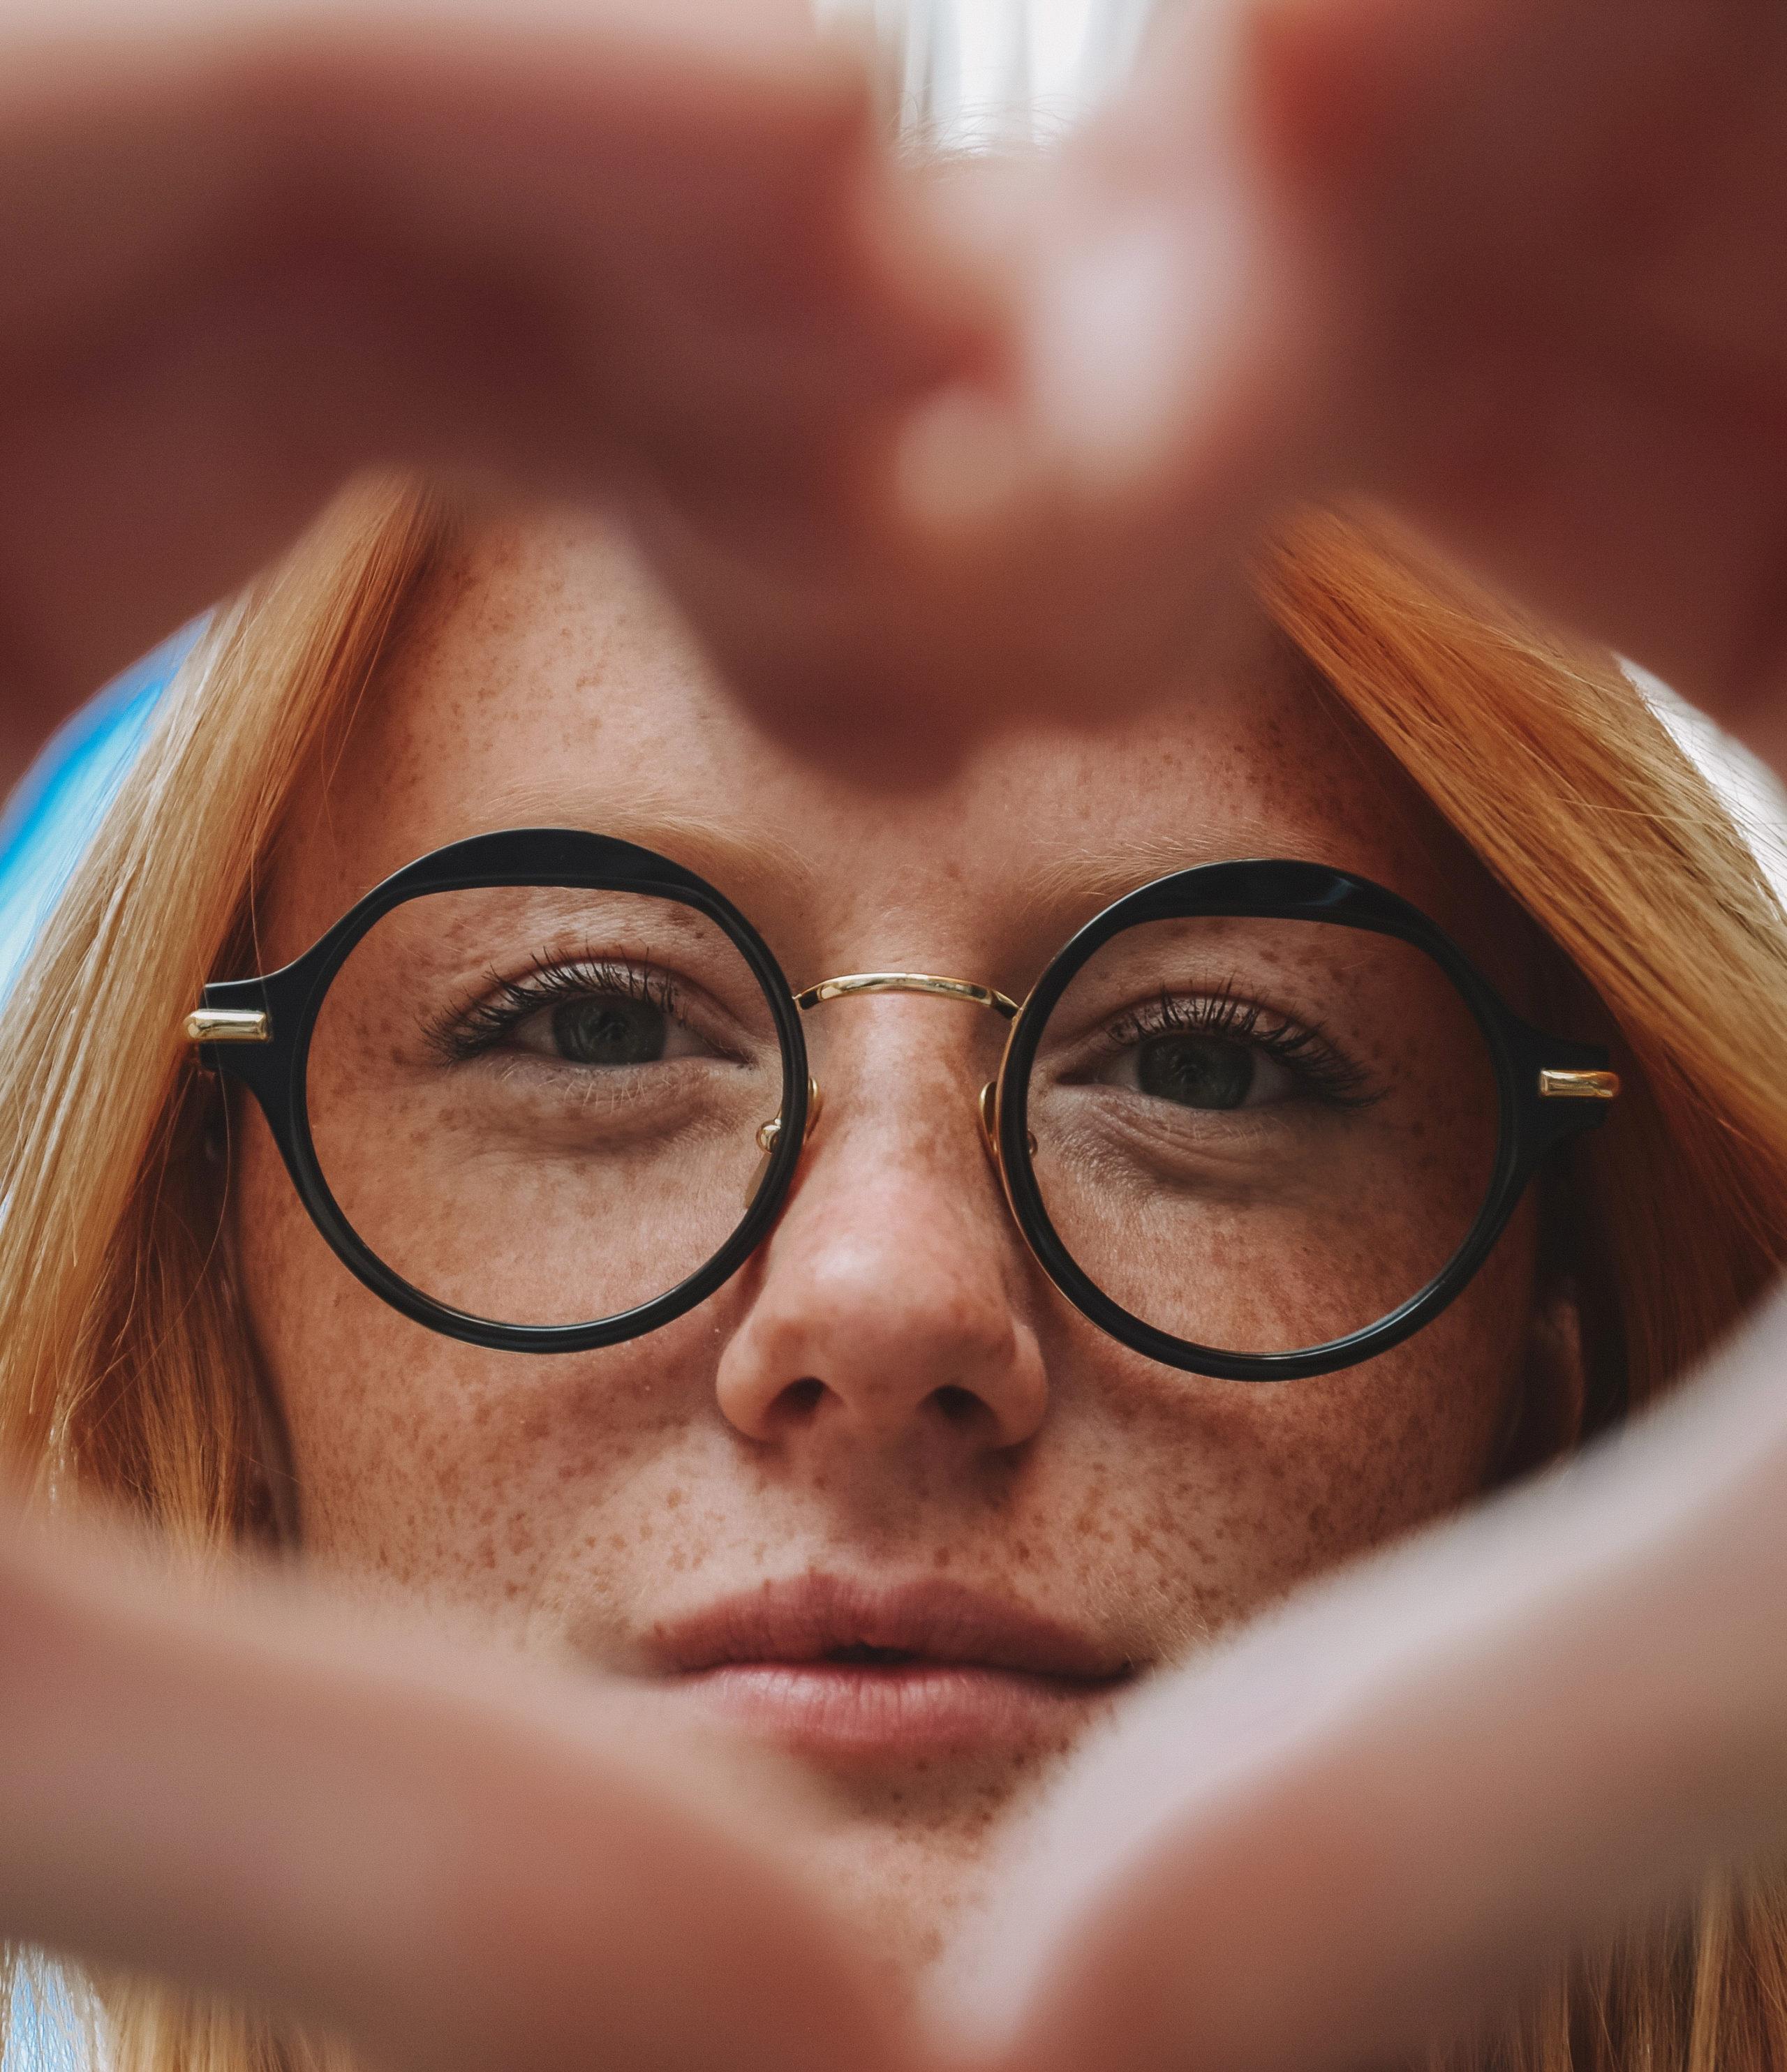 Kaleos brillen en zonnebrillen - Frames and Faces Deinze